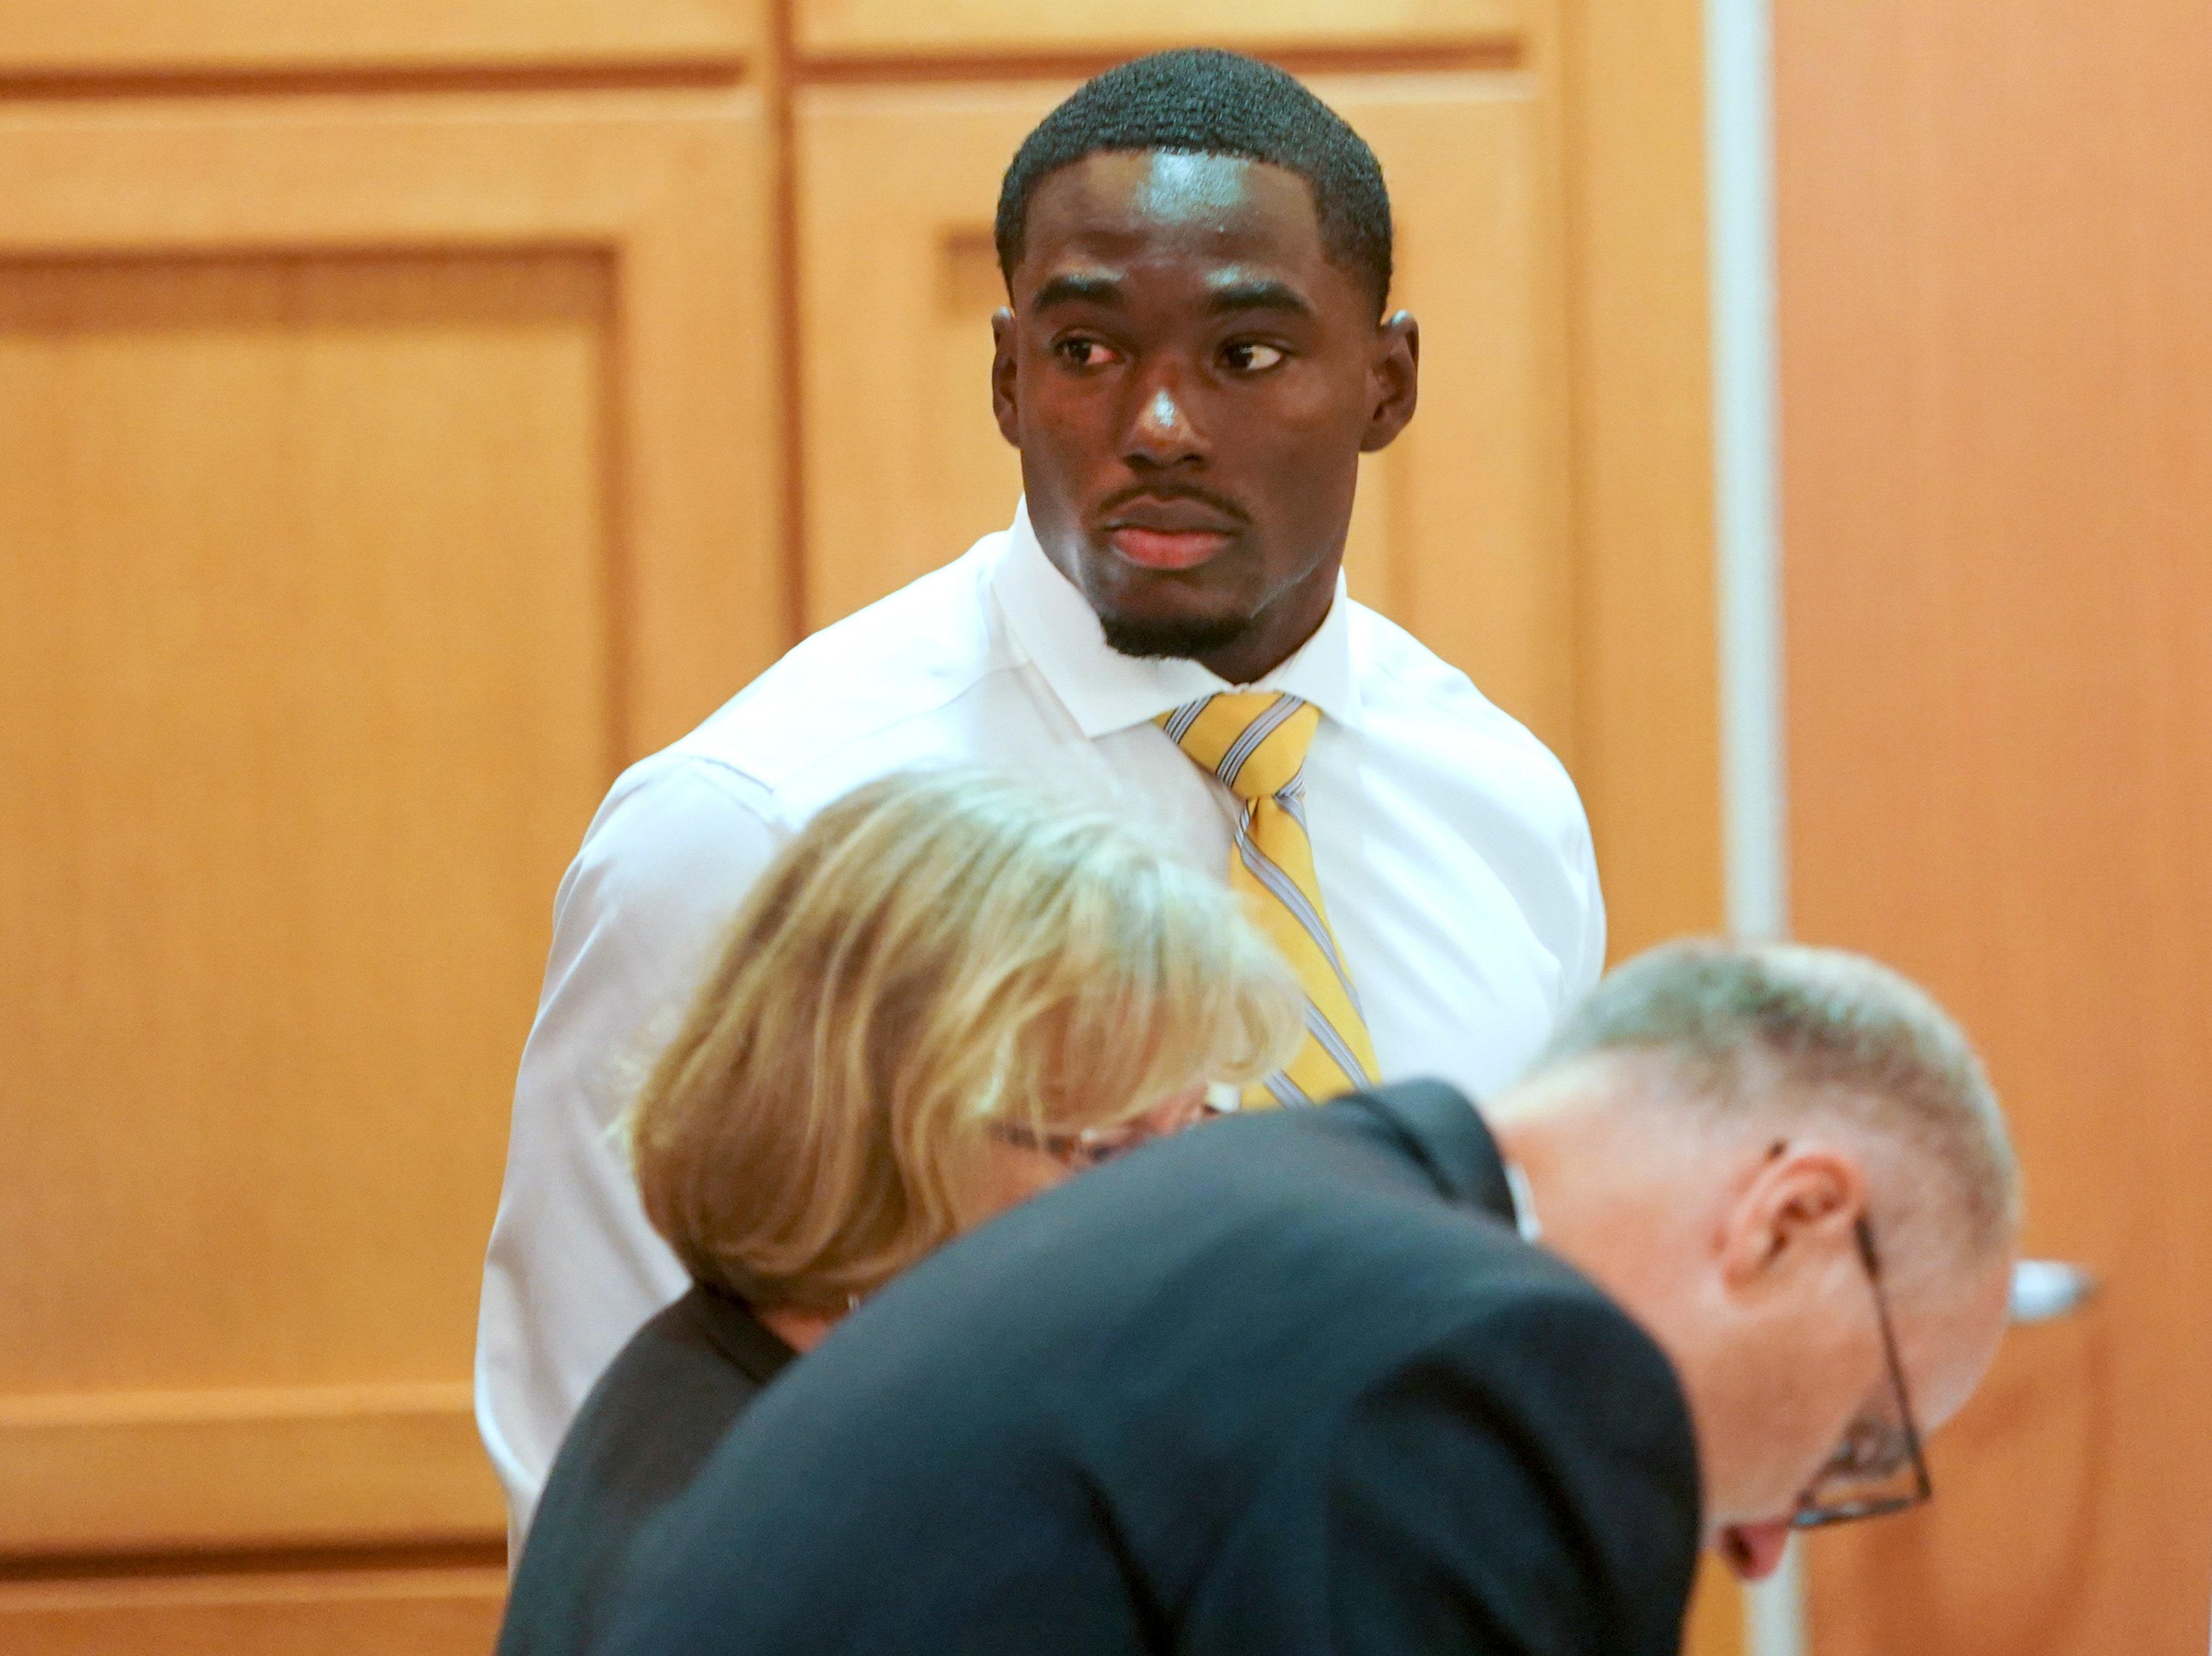 Former Wisconsin Badgers receiver Quintez Cephus acquitted